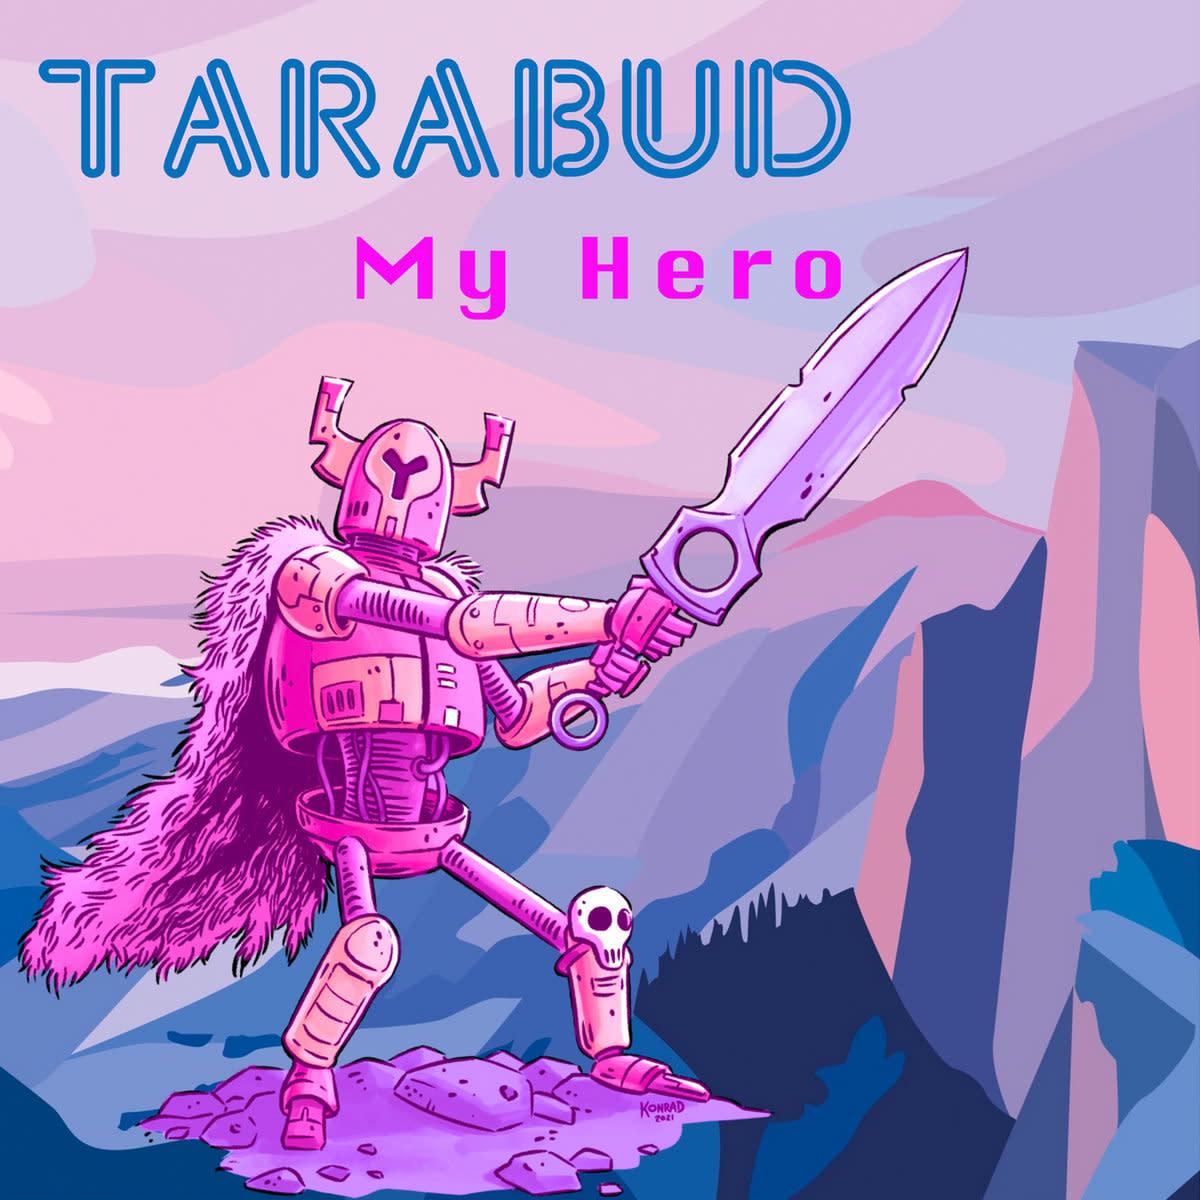 synth-single-review-my-hero-by-tarabud